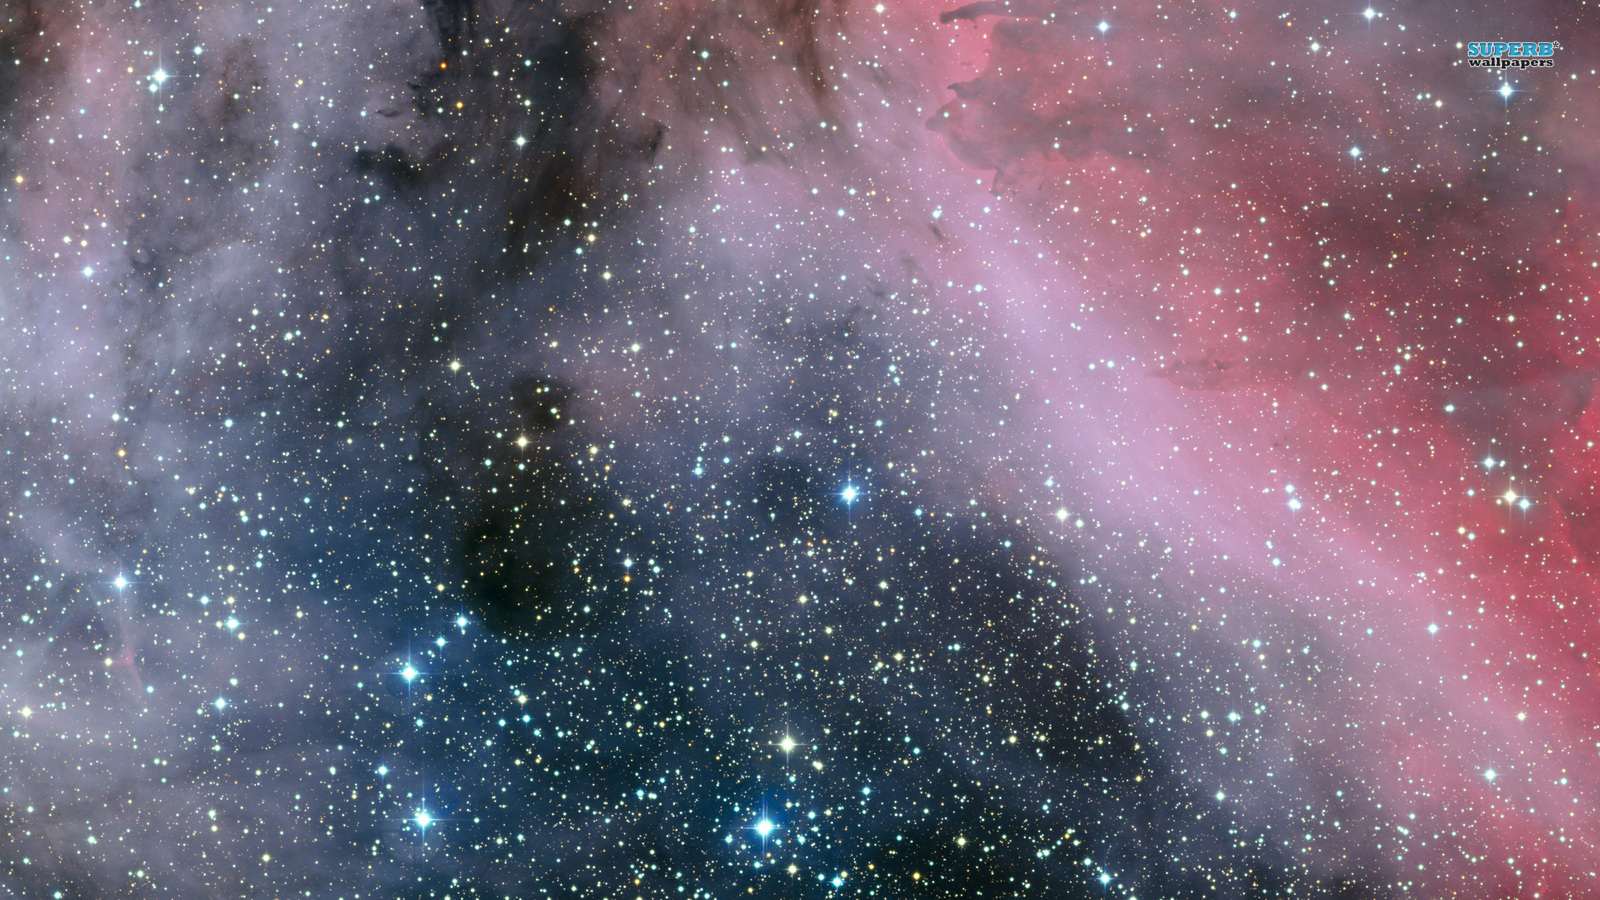 Carina Nebula 5K Wallpapers  HD Wallpapers  ID 19078